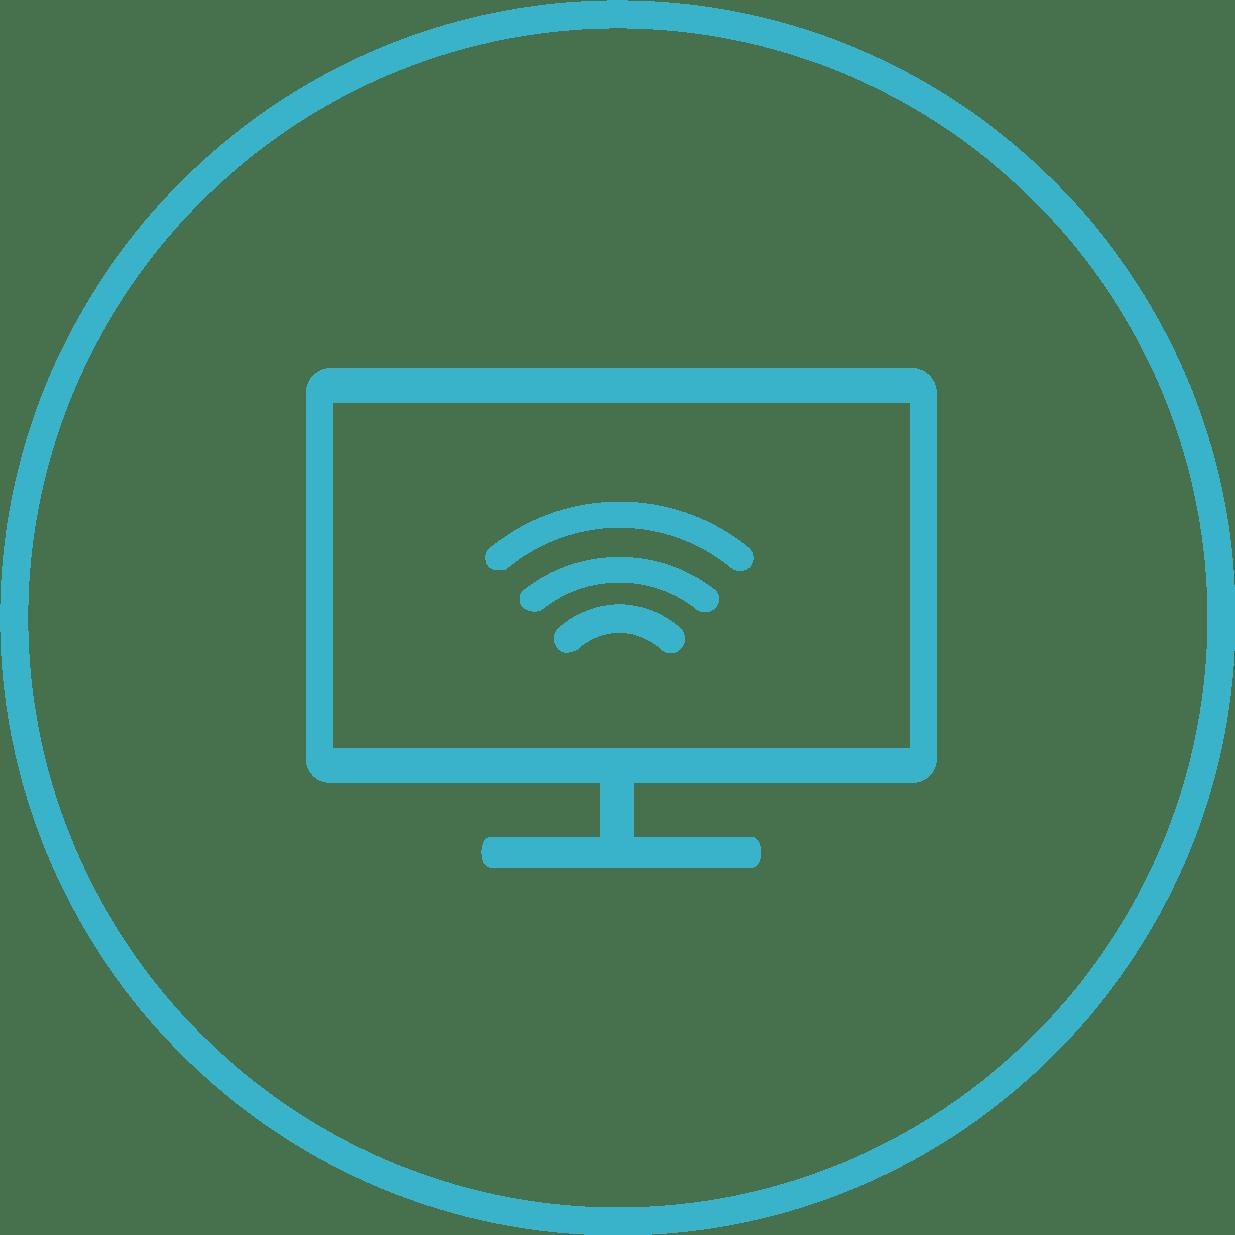 Icon - TV & Internet